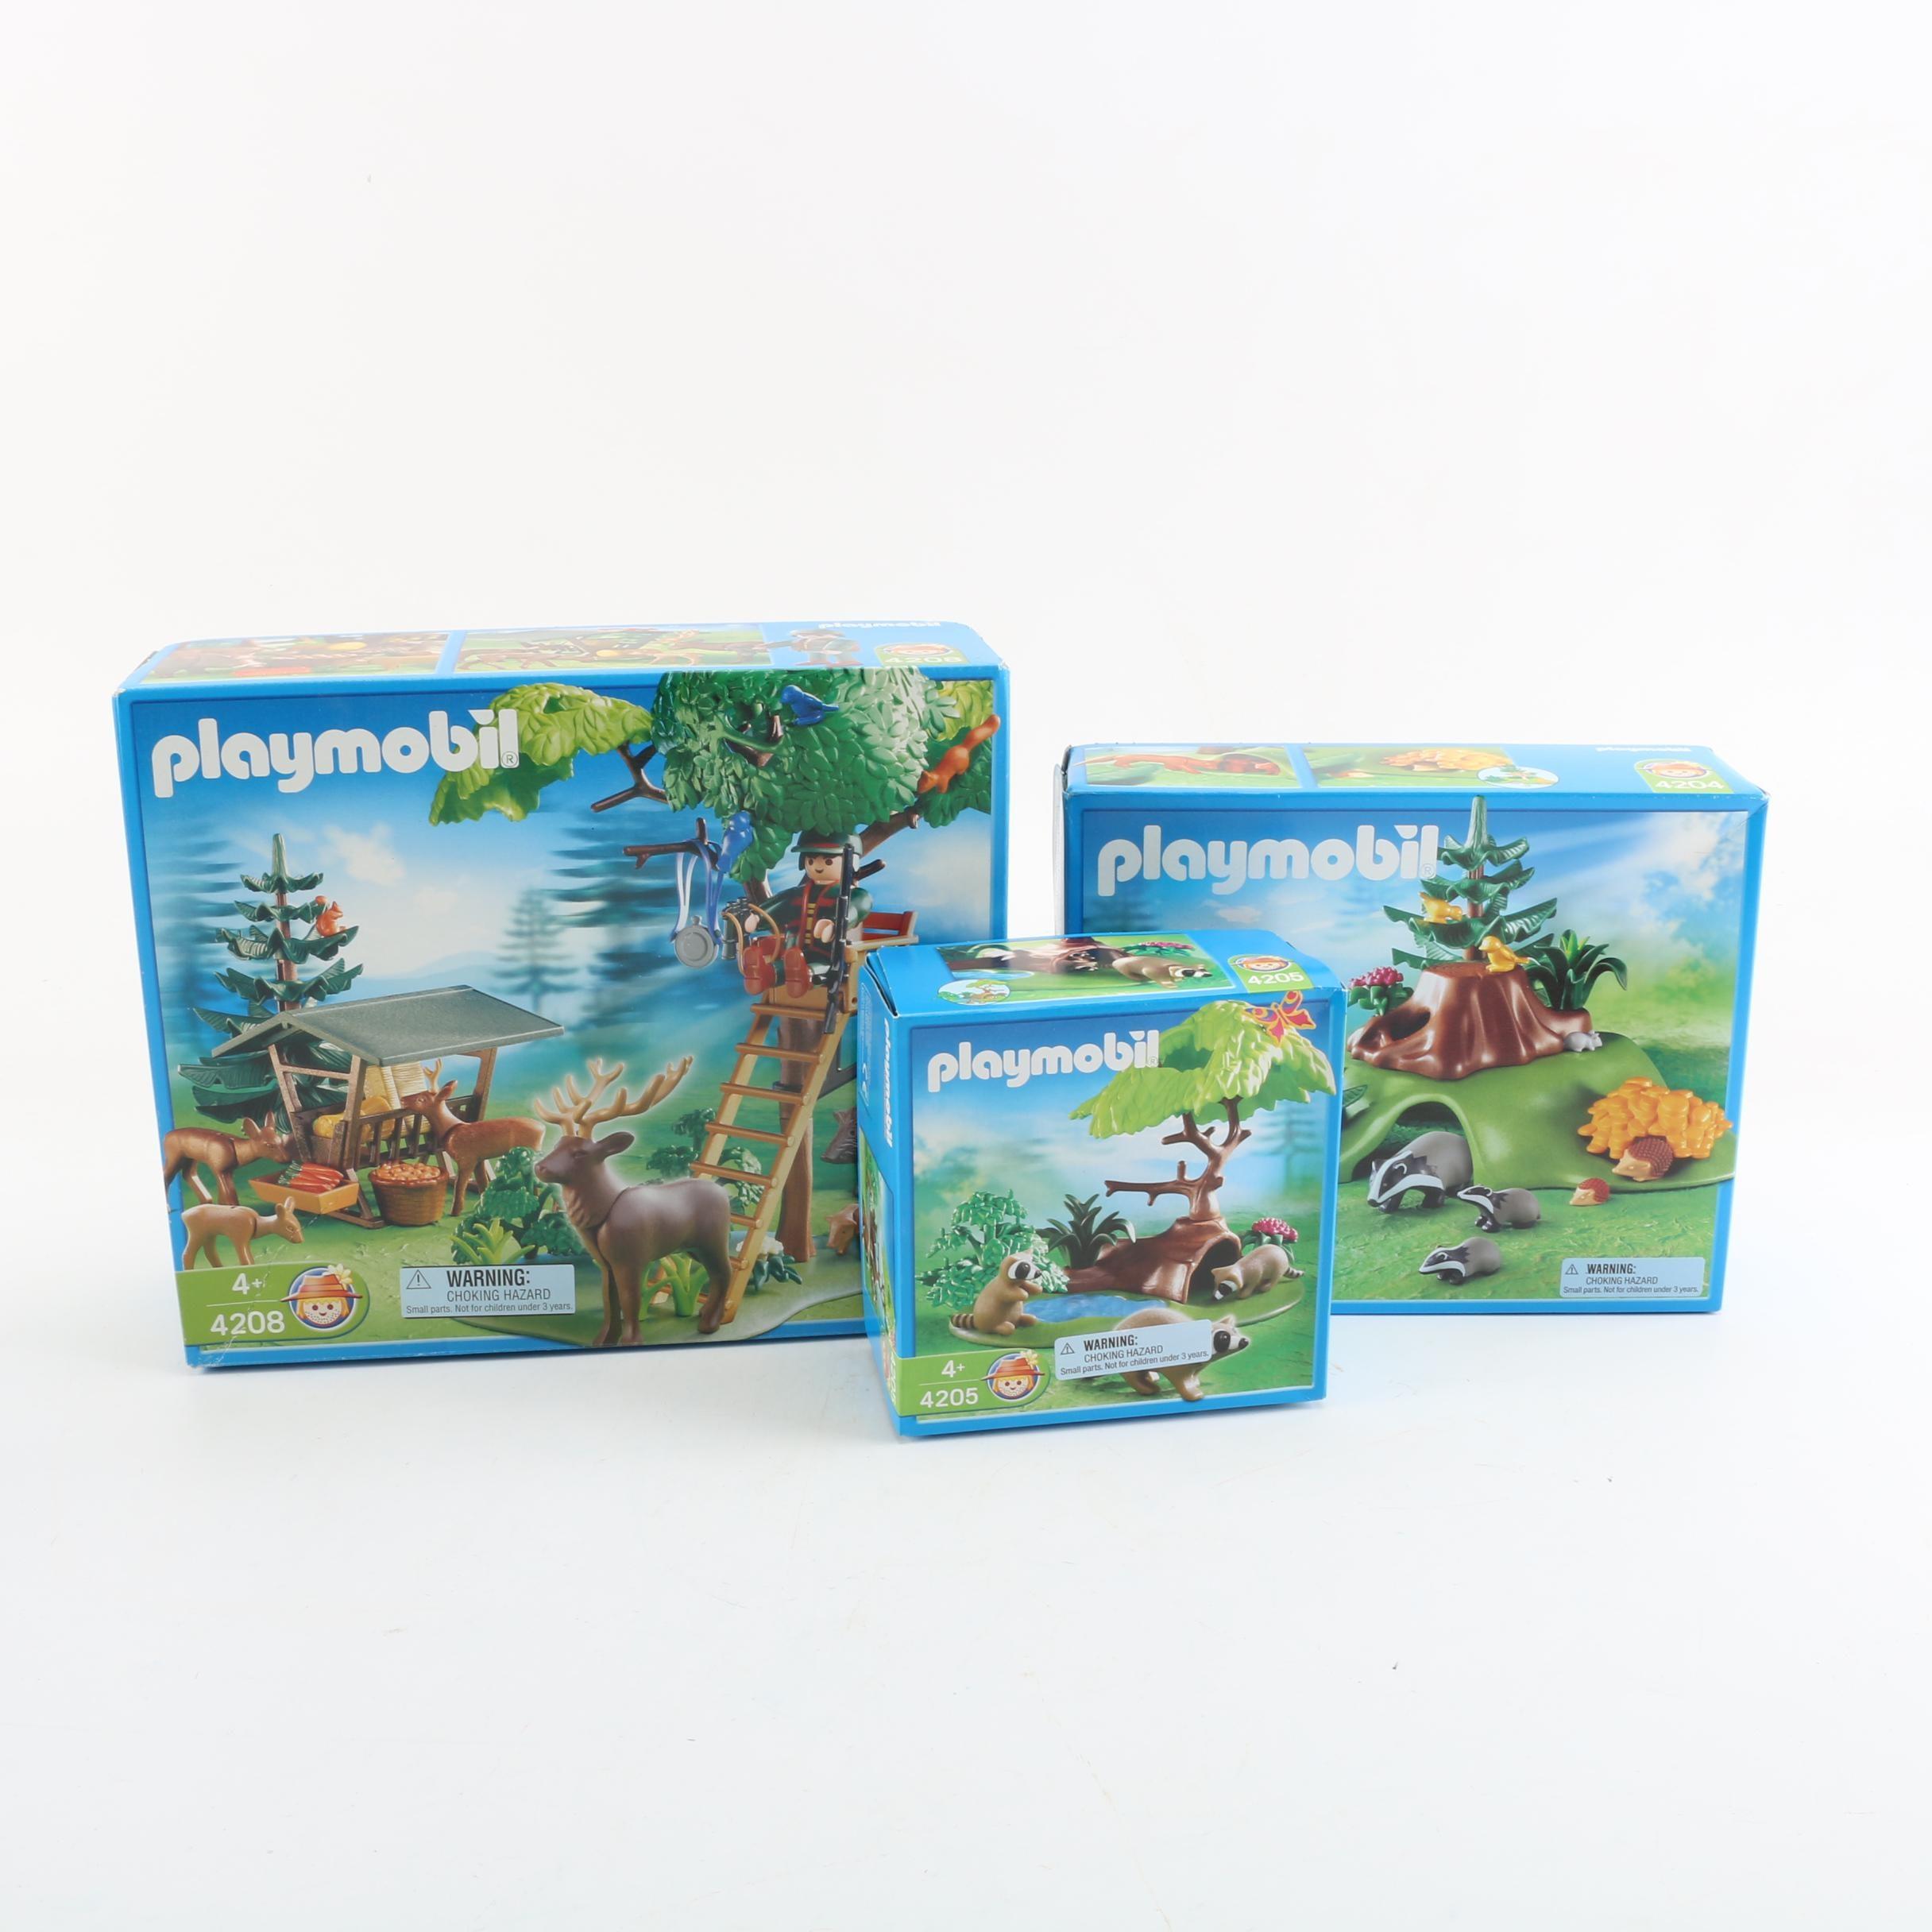 Playmobil Woodland Play Sets